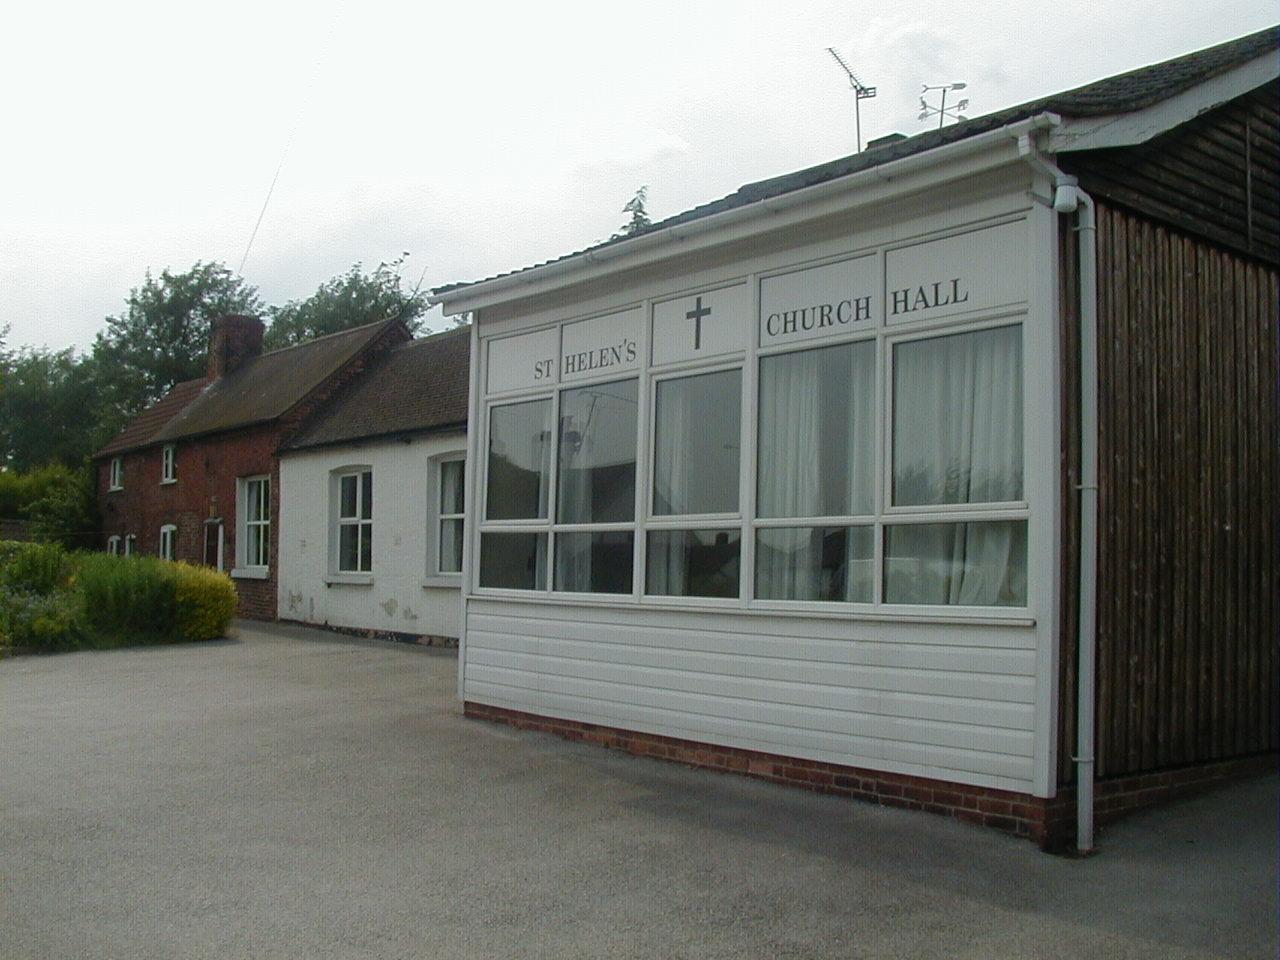 Church Hall